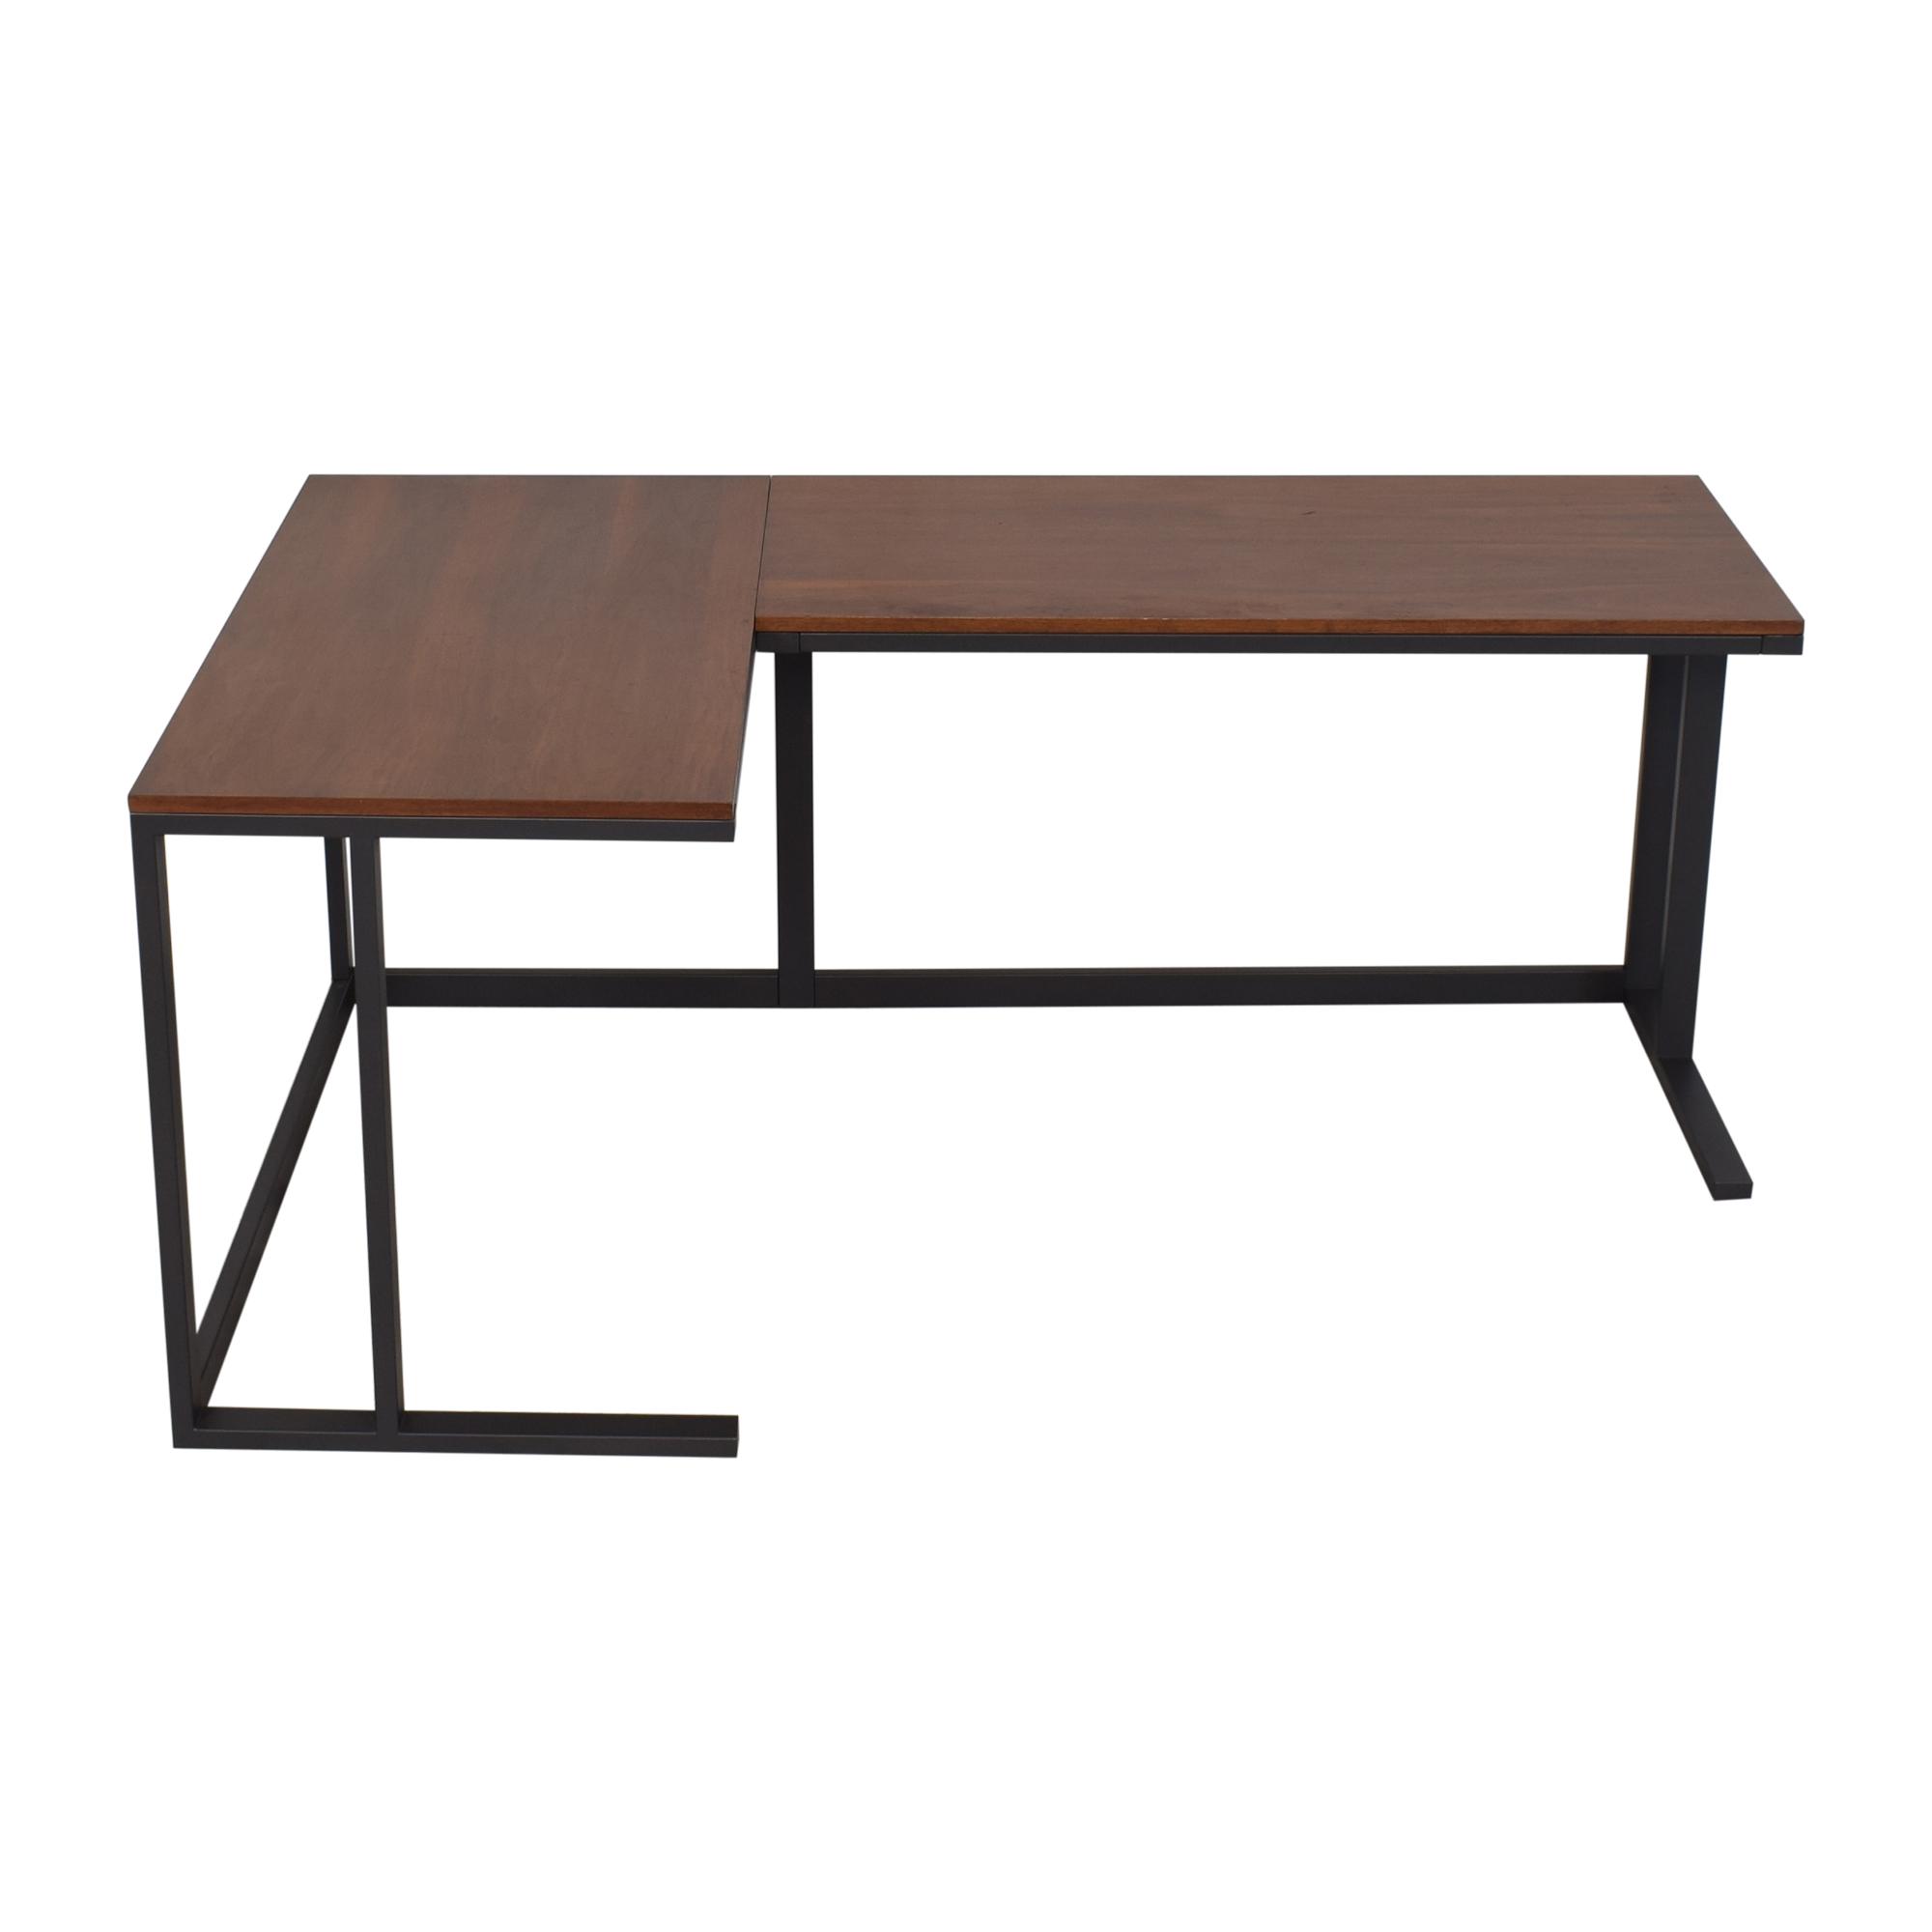 Crate & Barrel Crate & Barrel Pilsen Corner Desk used